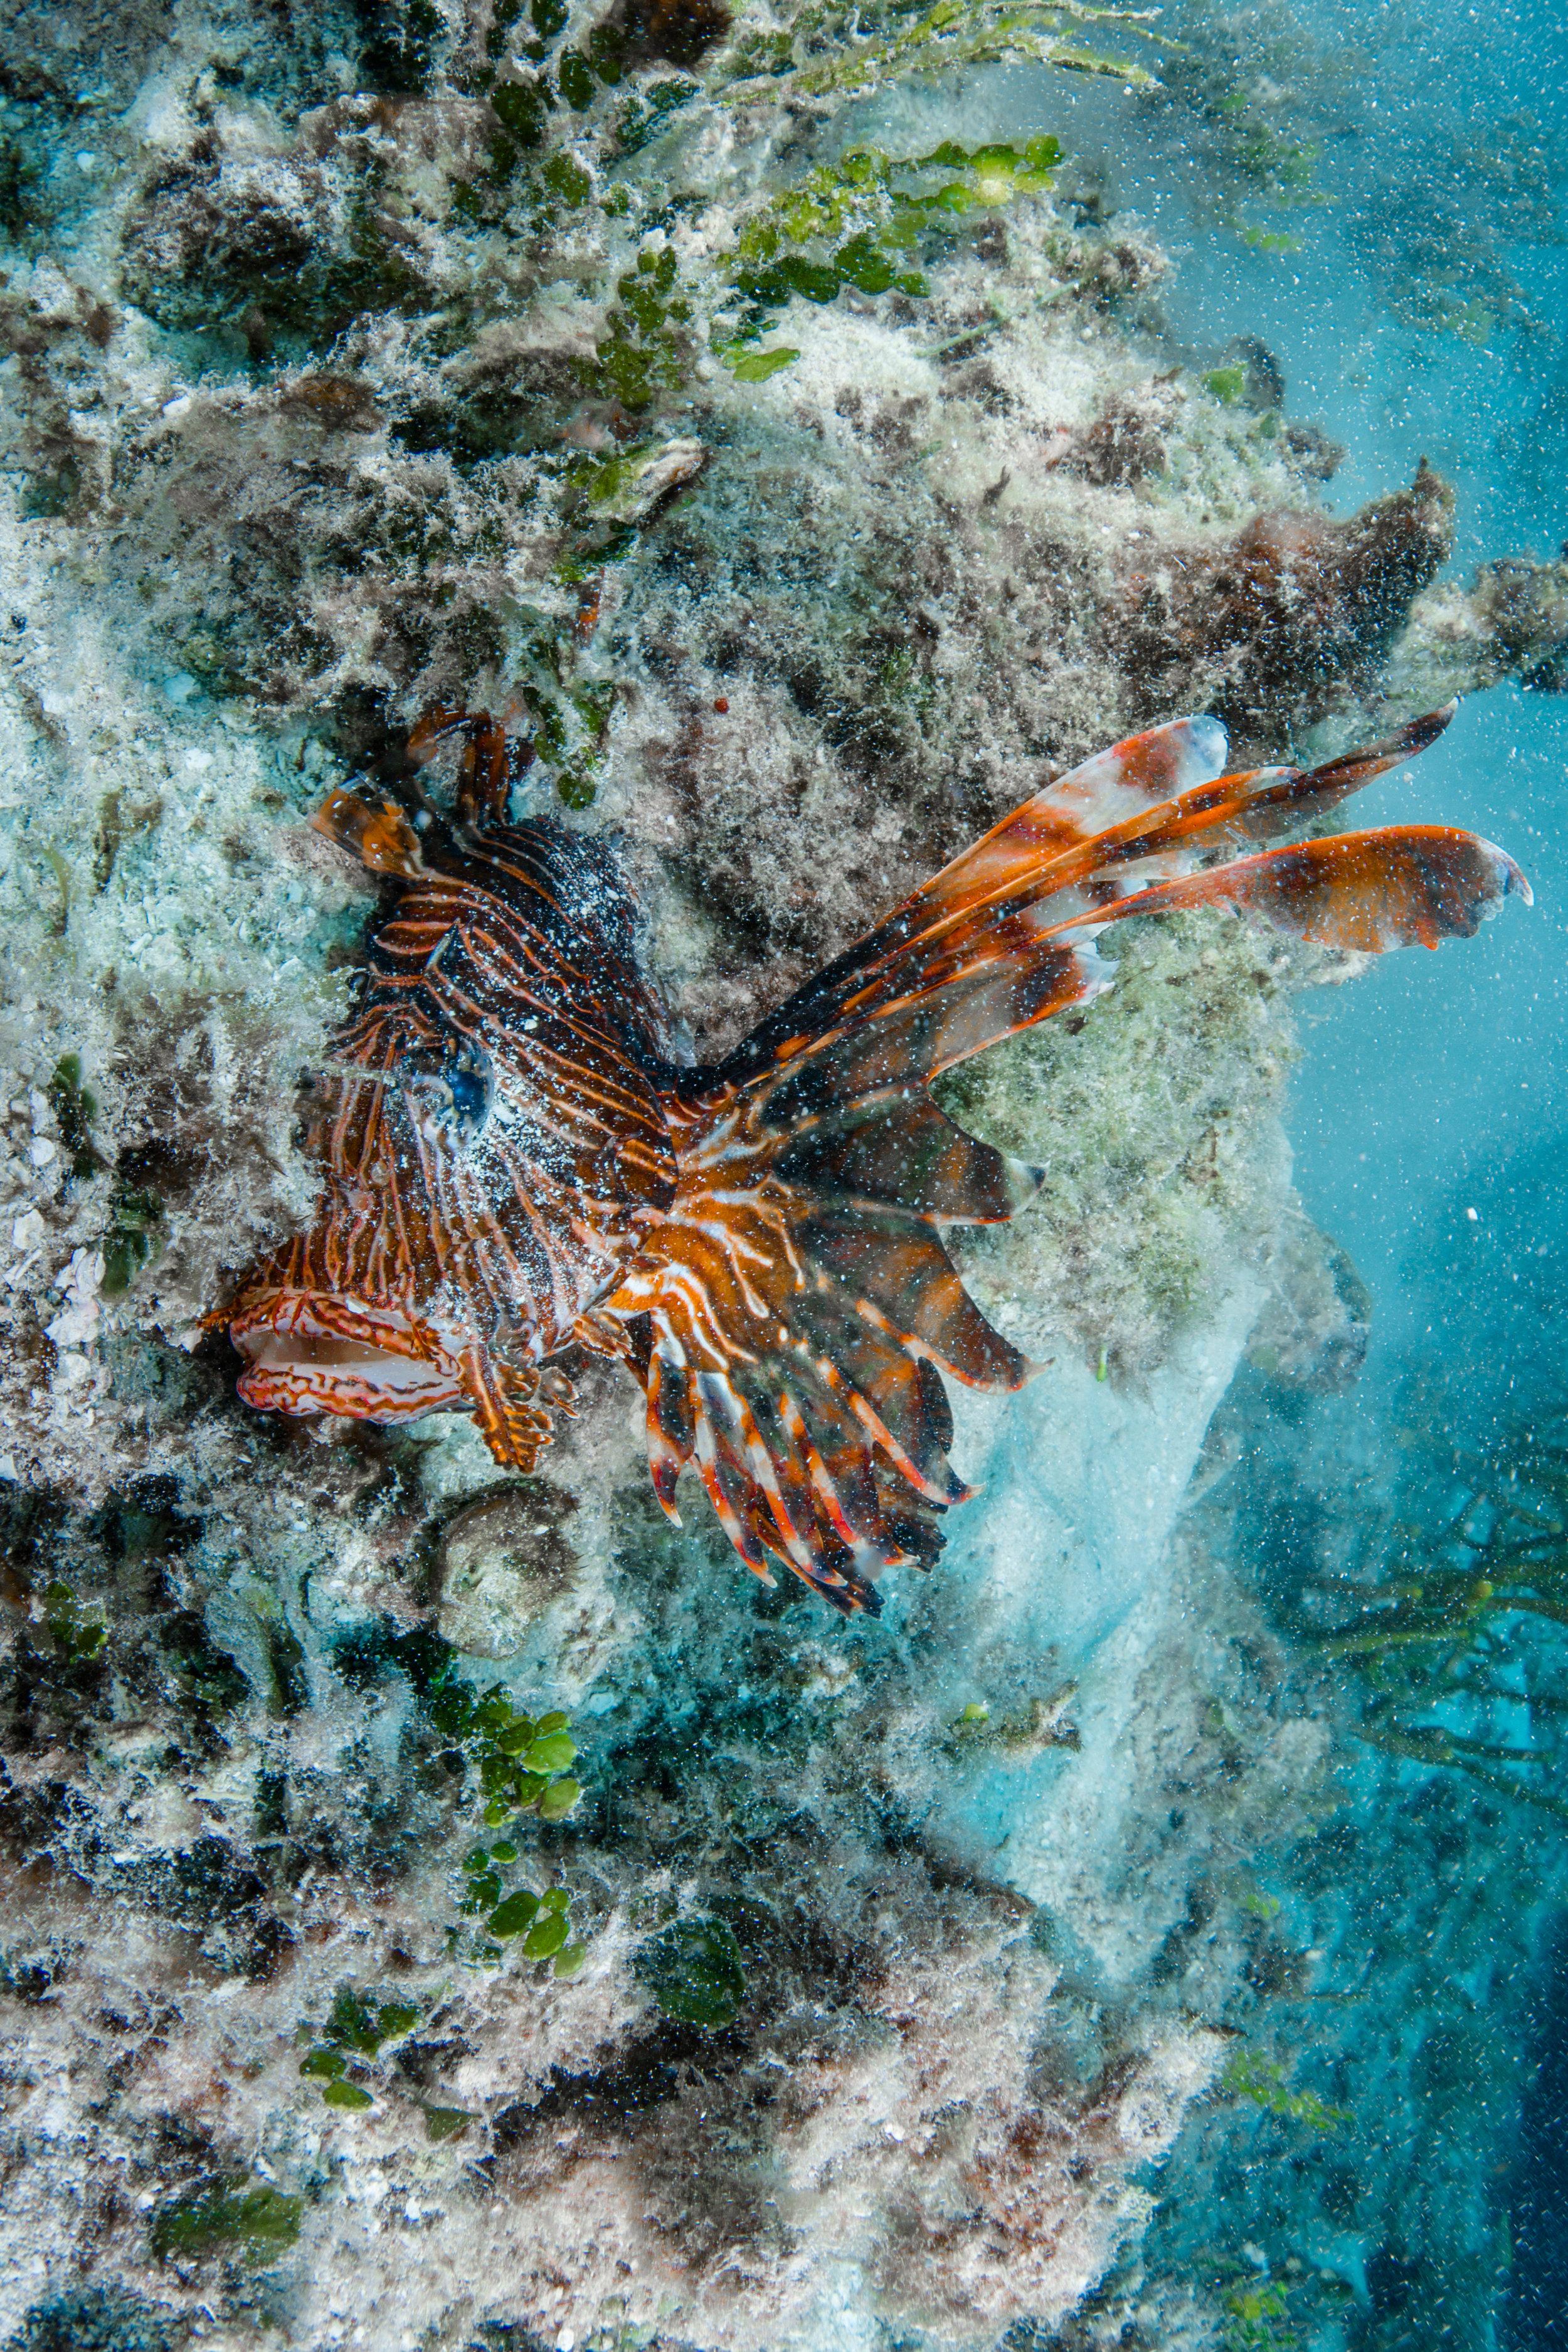 Lion Fish - Cozumel Mexico - Scuba Diving - Underwater photography